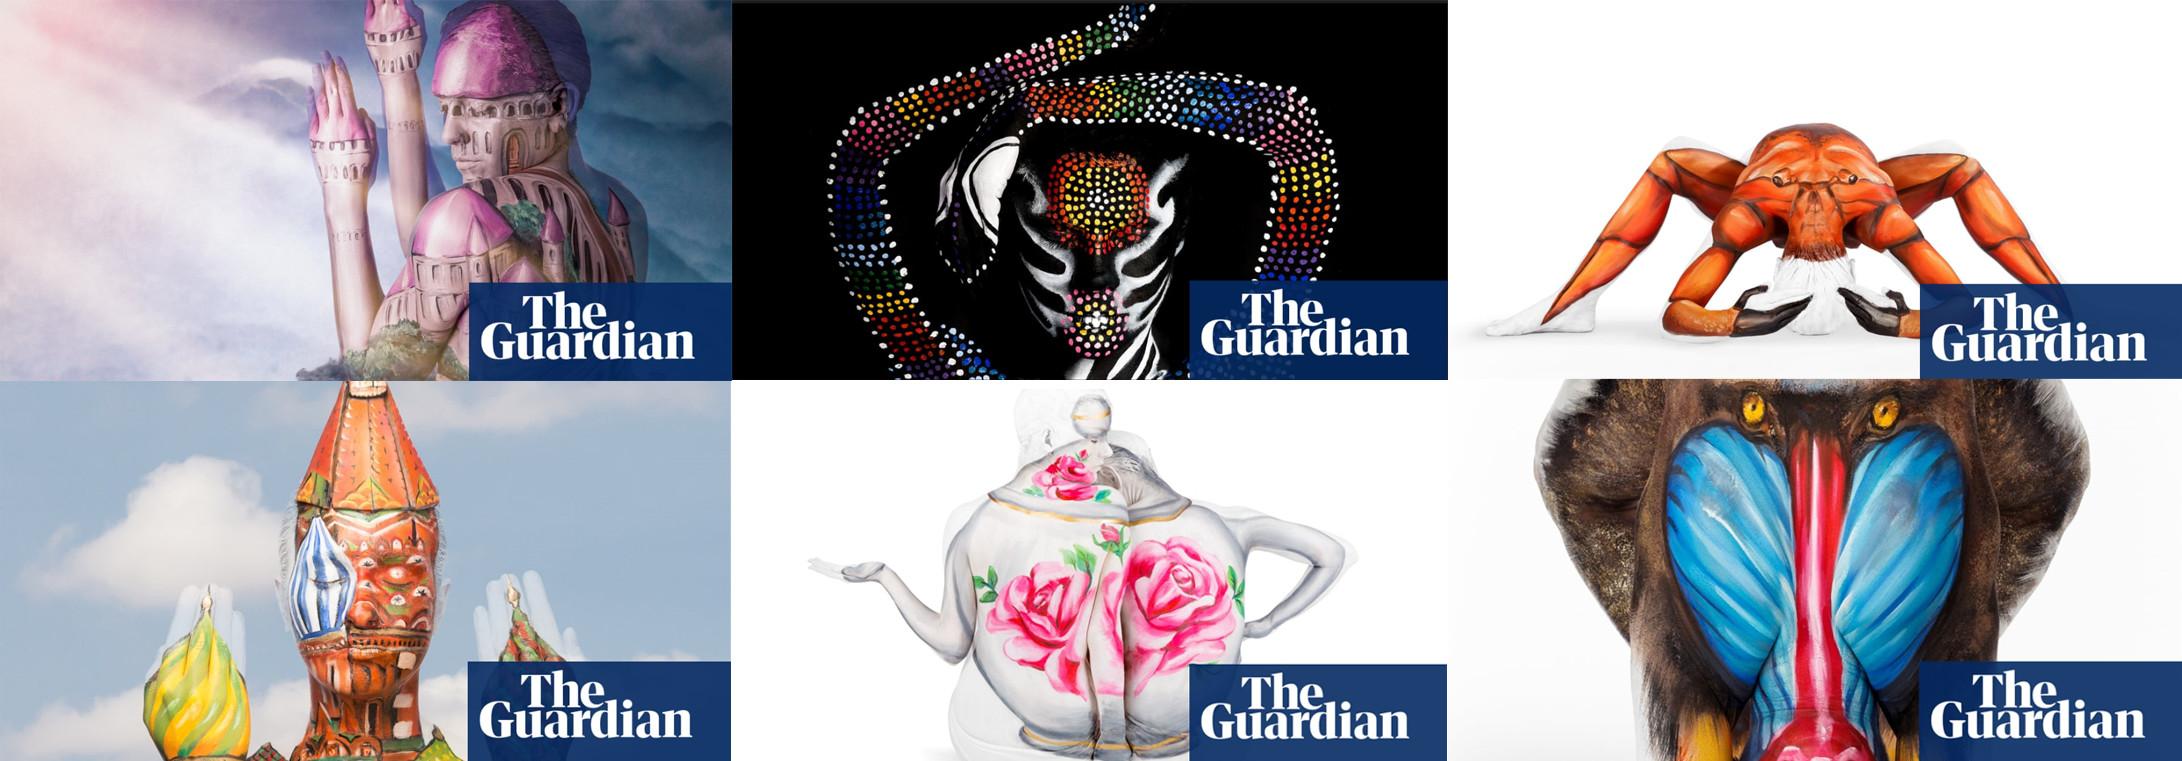 Guardian image archive